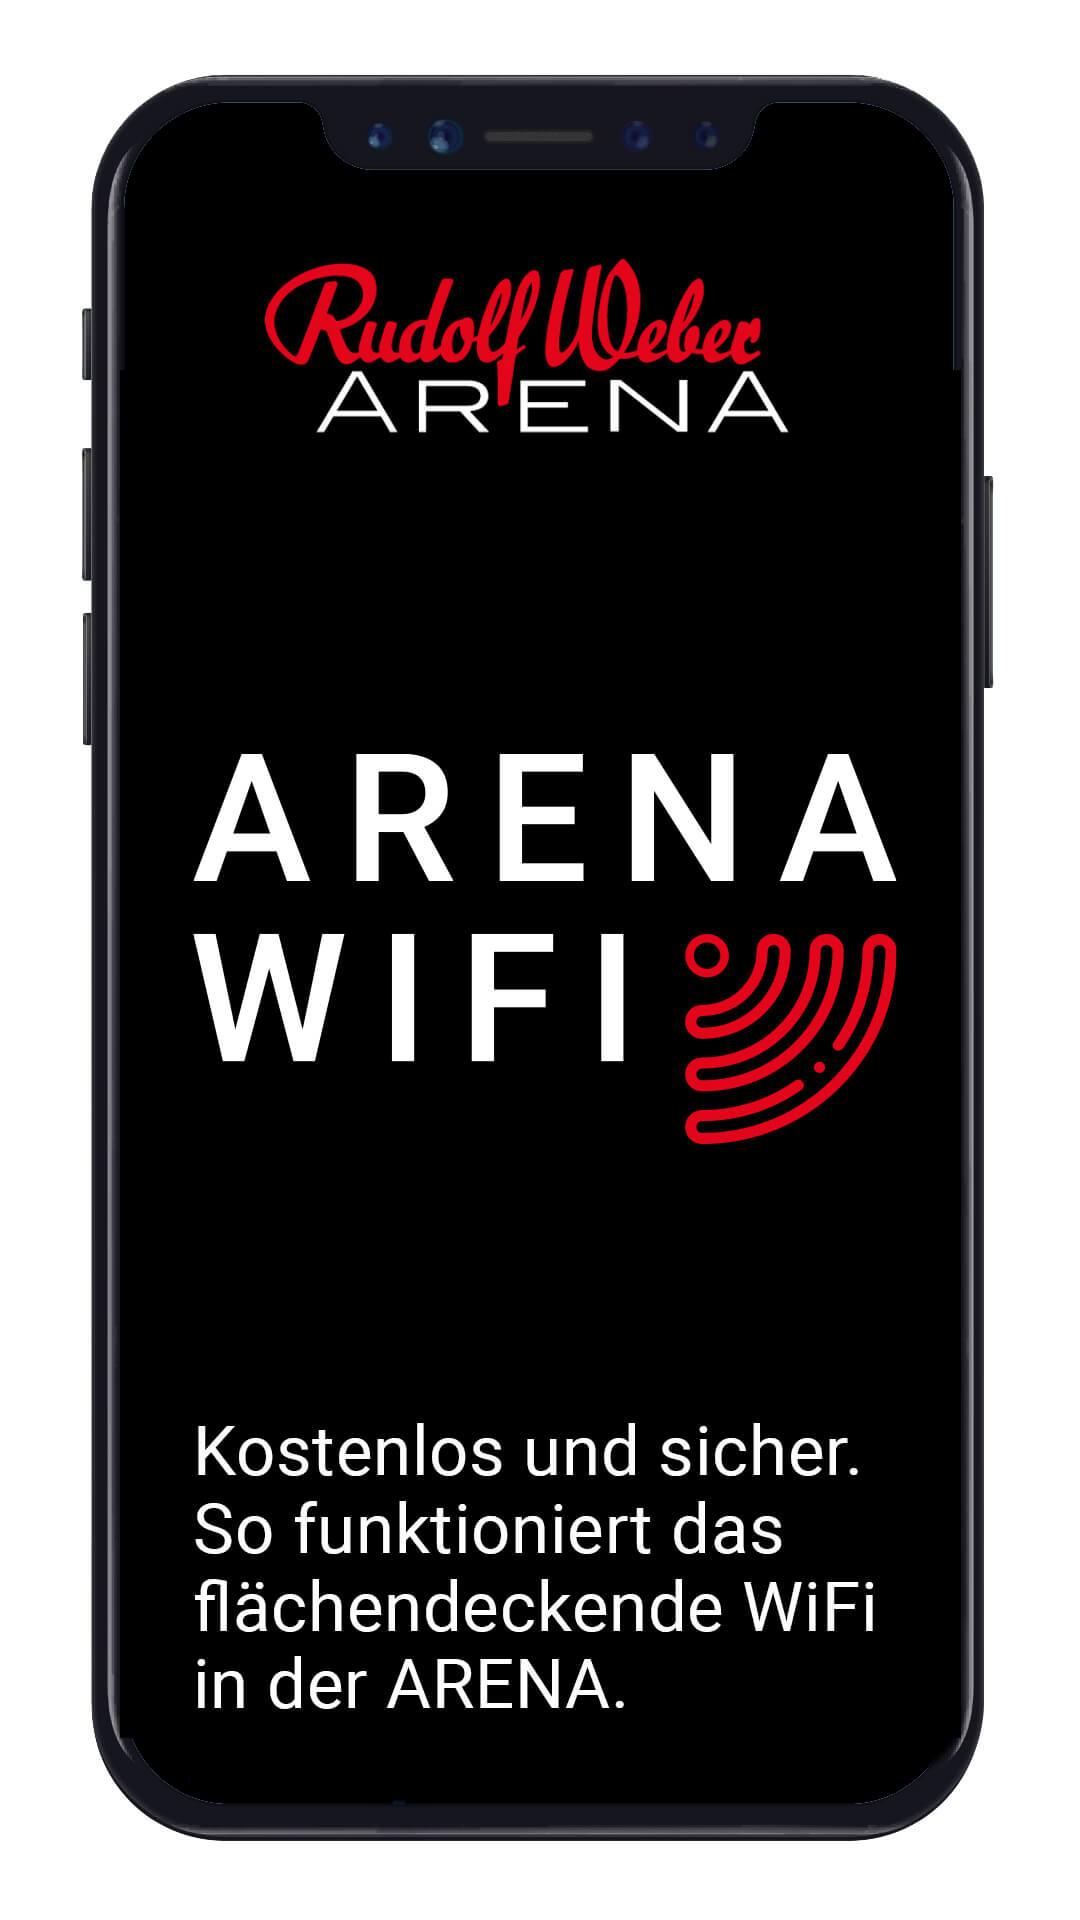 ARENA WiFi Login Portal